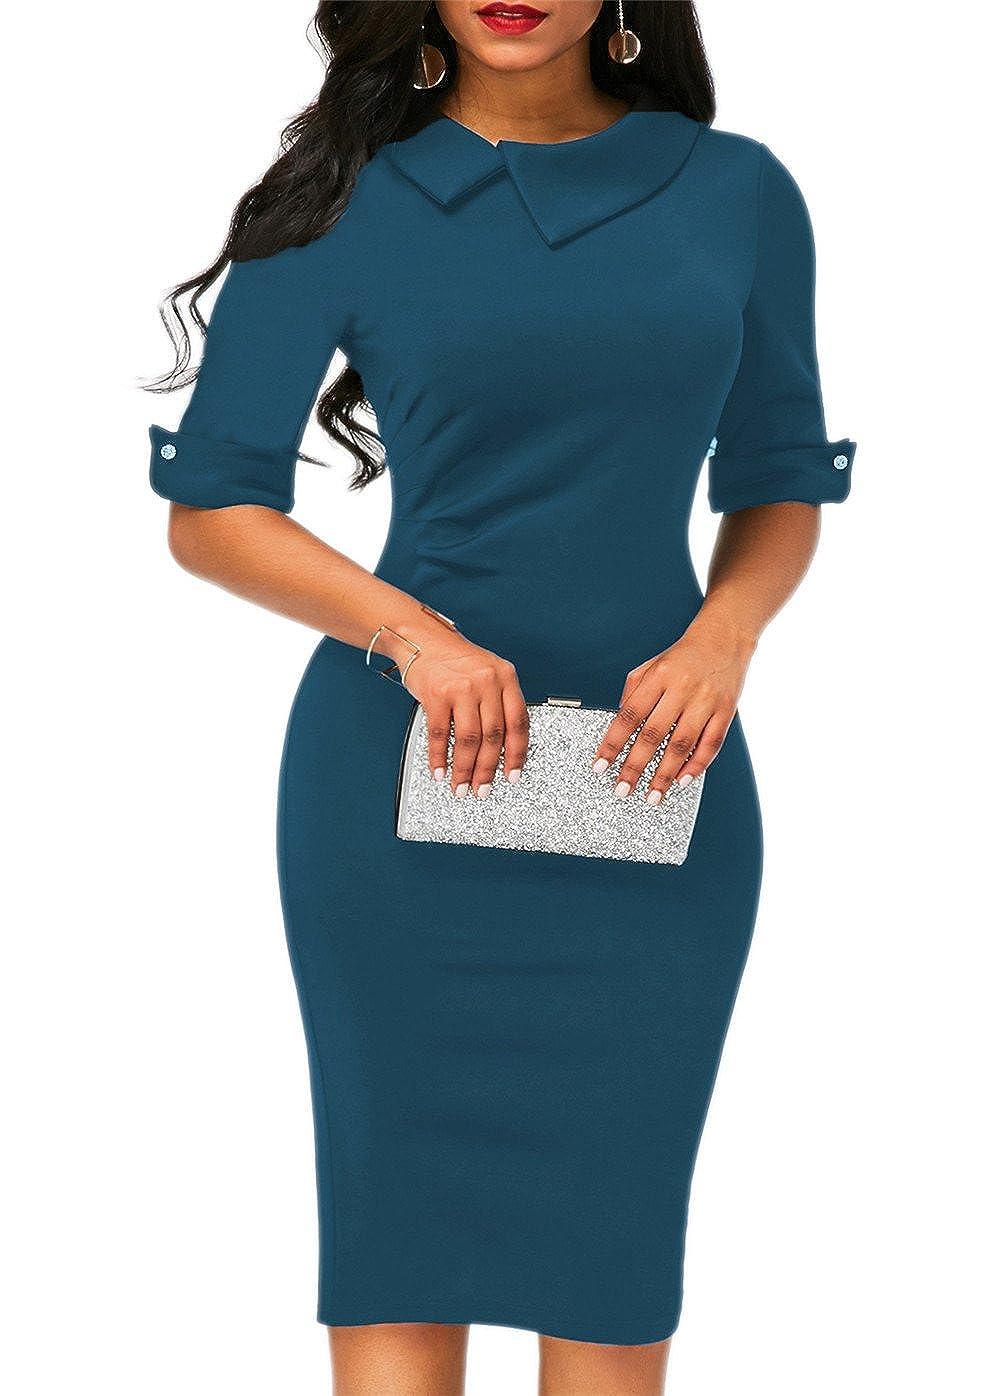 KISSMODA Women's Below Casual Plested Tunic Tops Dress Jumpsuit